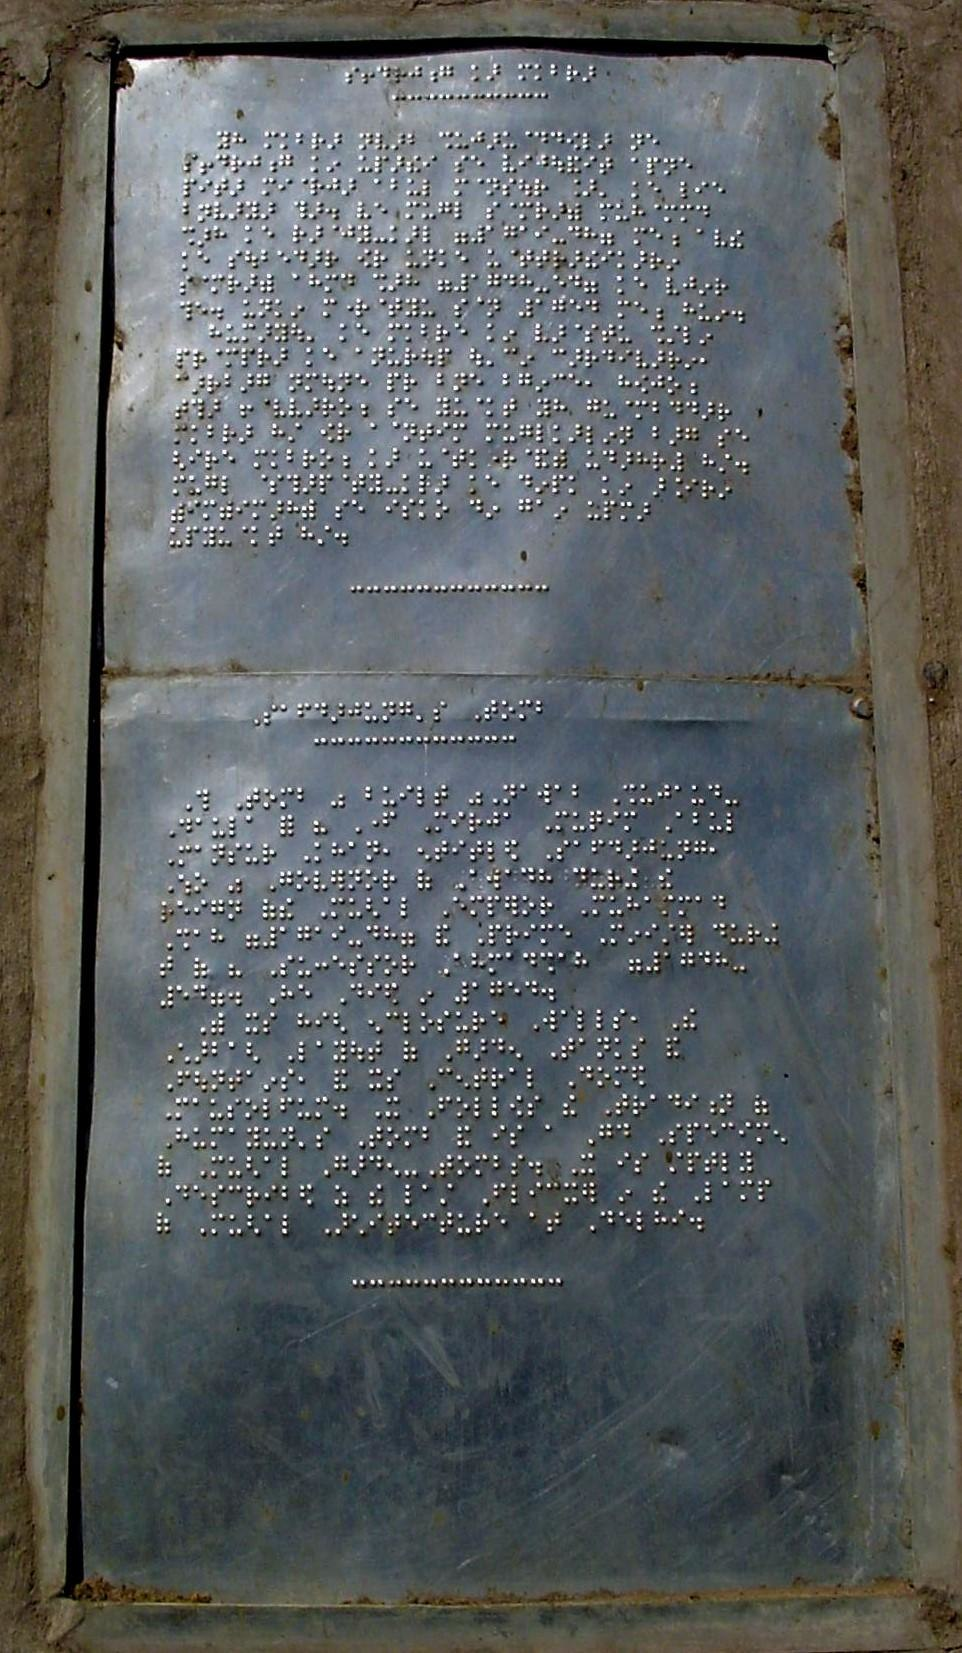 Braille notice board